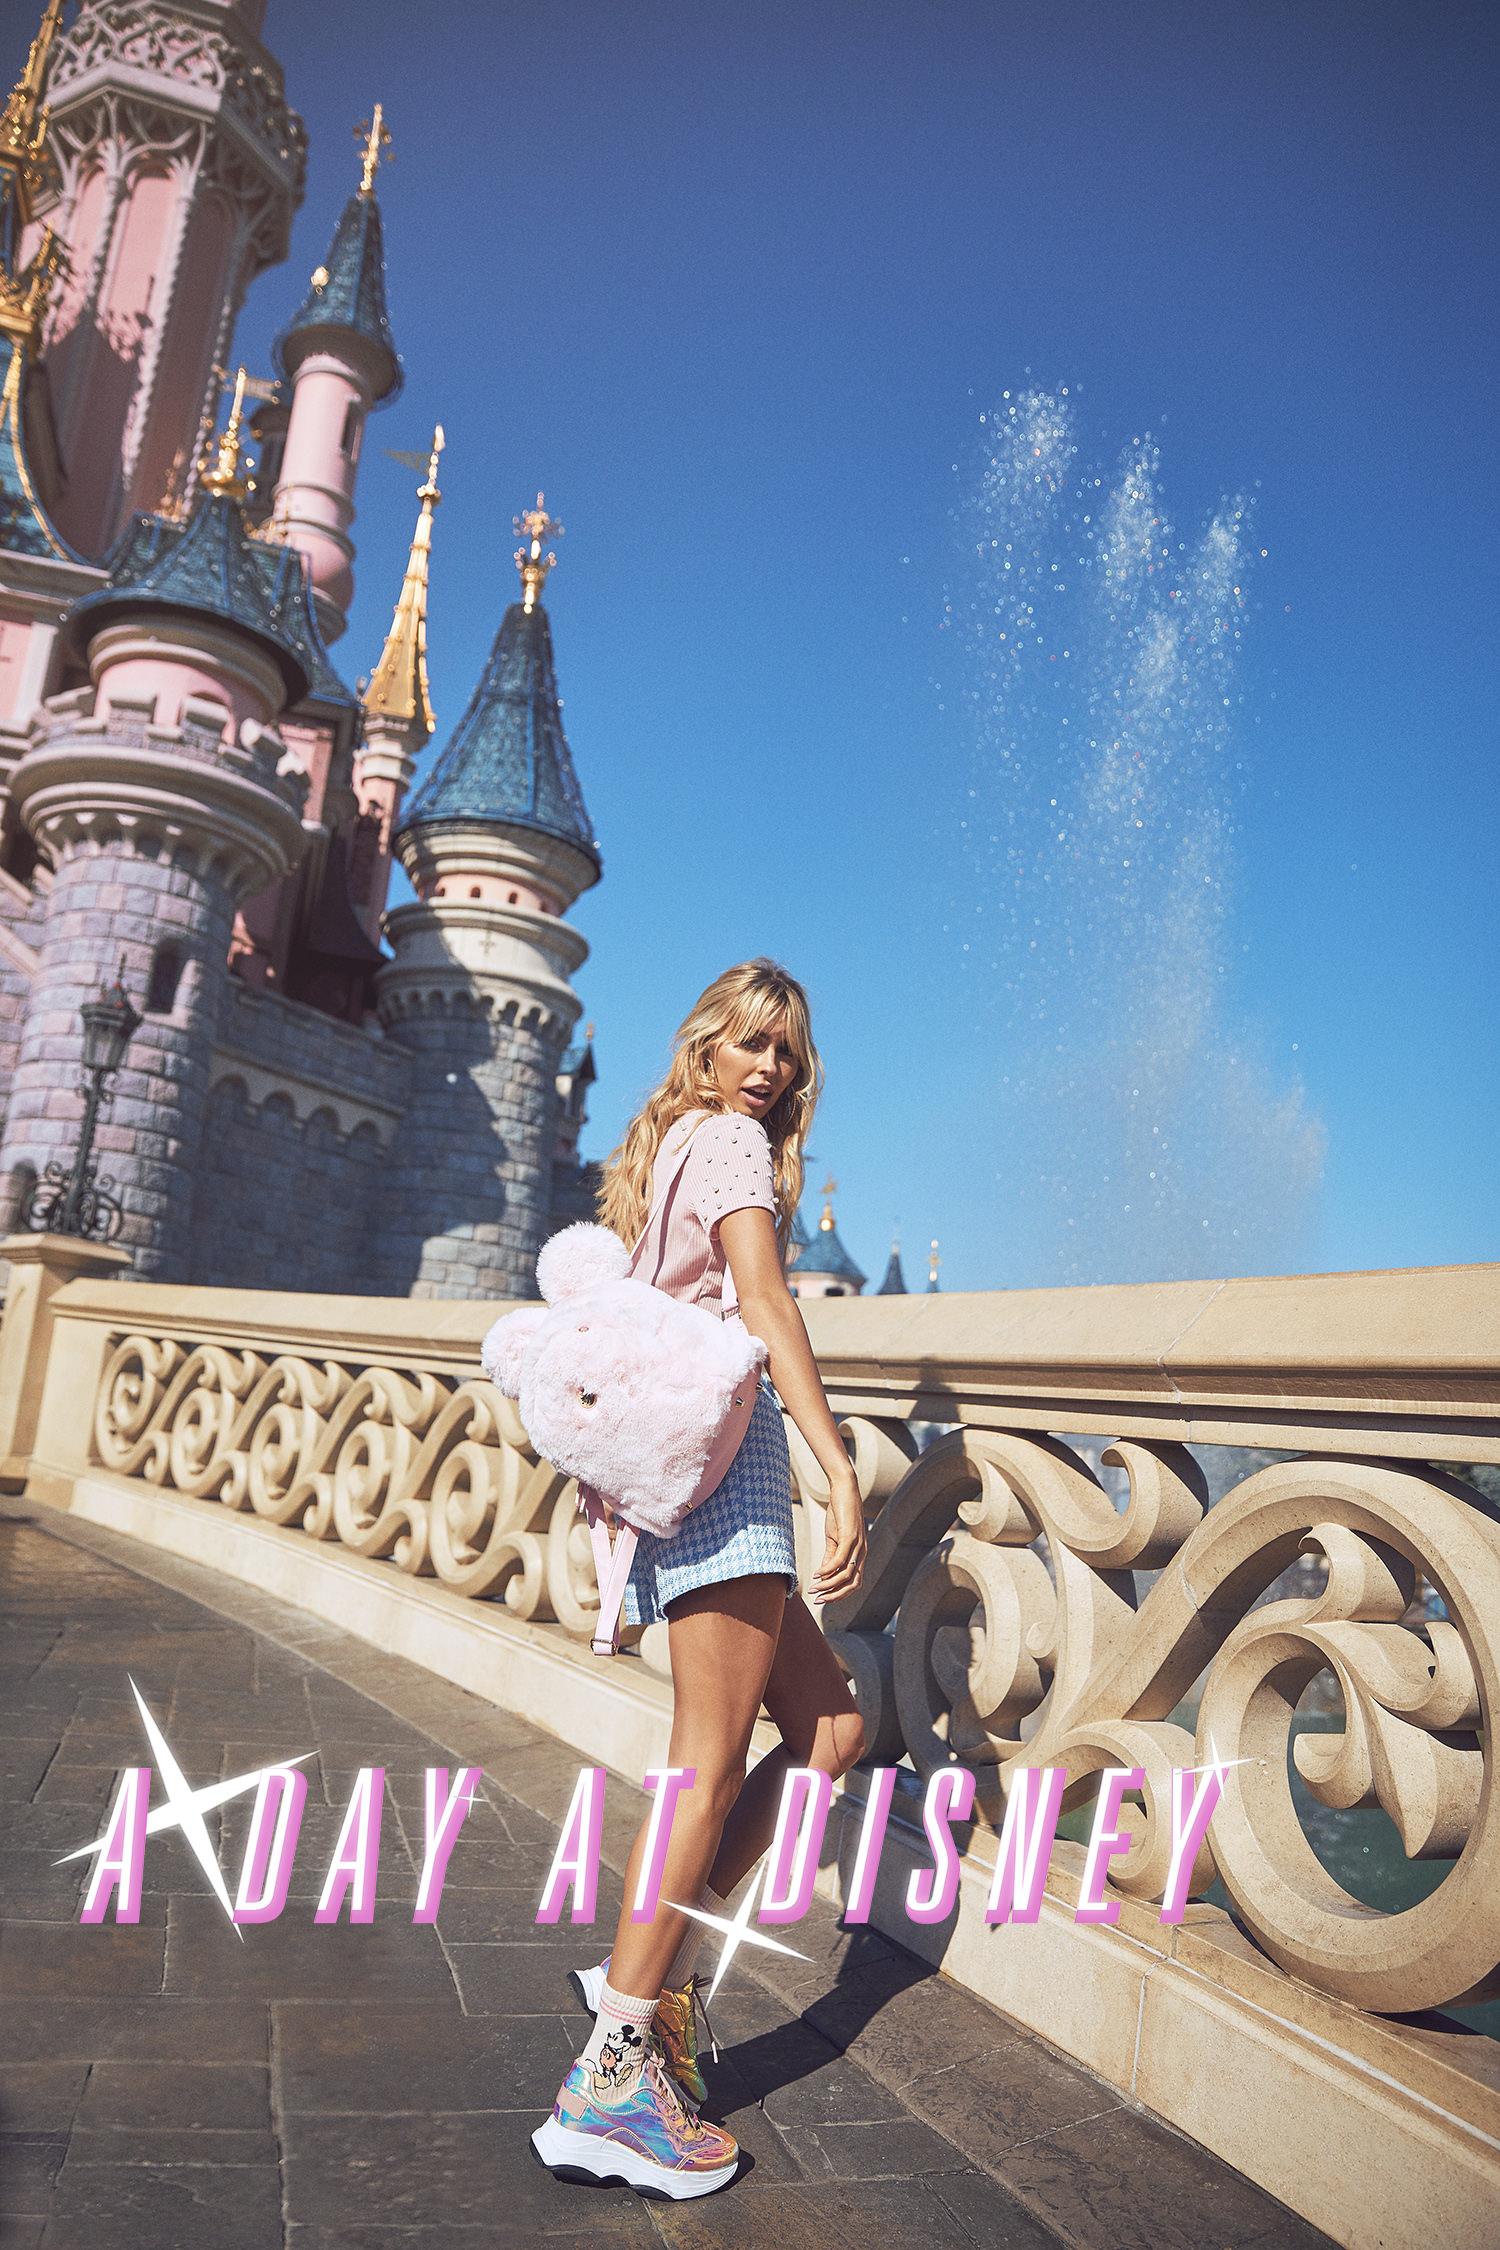 disneyland-paris-photoshoot-pink-london-fashion-photographer-ruth-rose-disney-florida-disneyworld-blogger-amy-neville-1.jpg